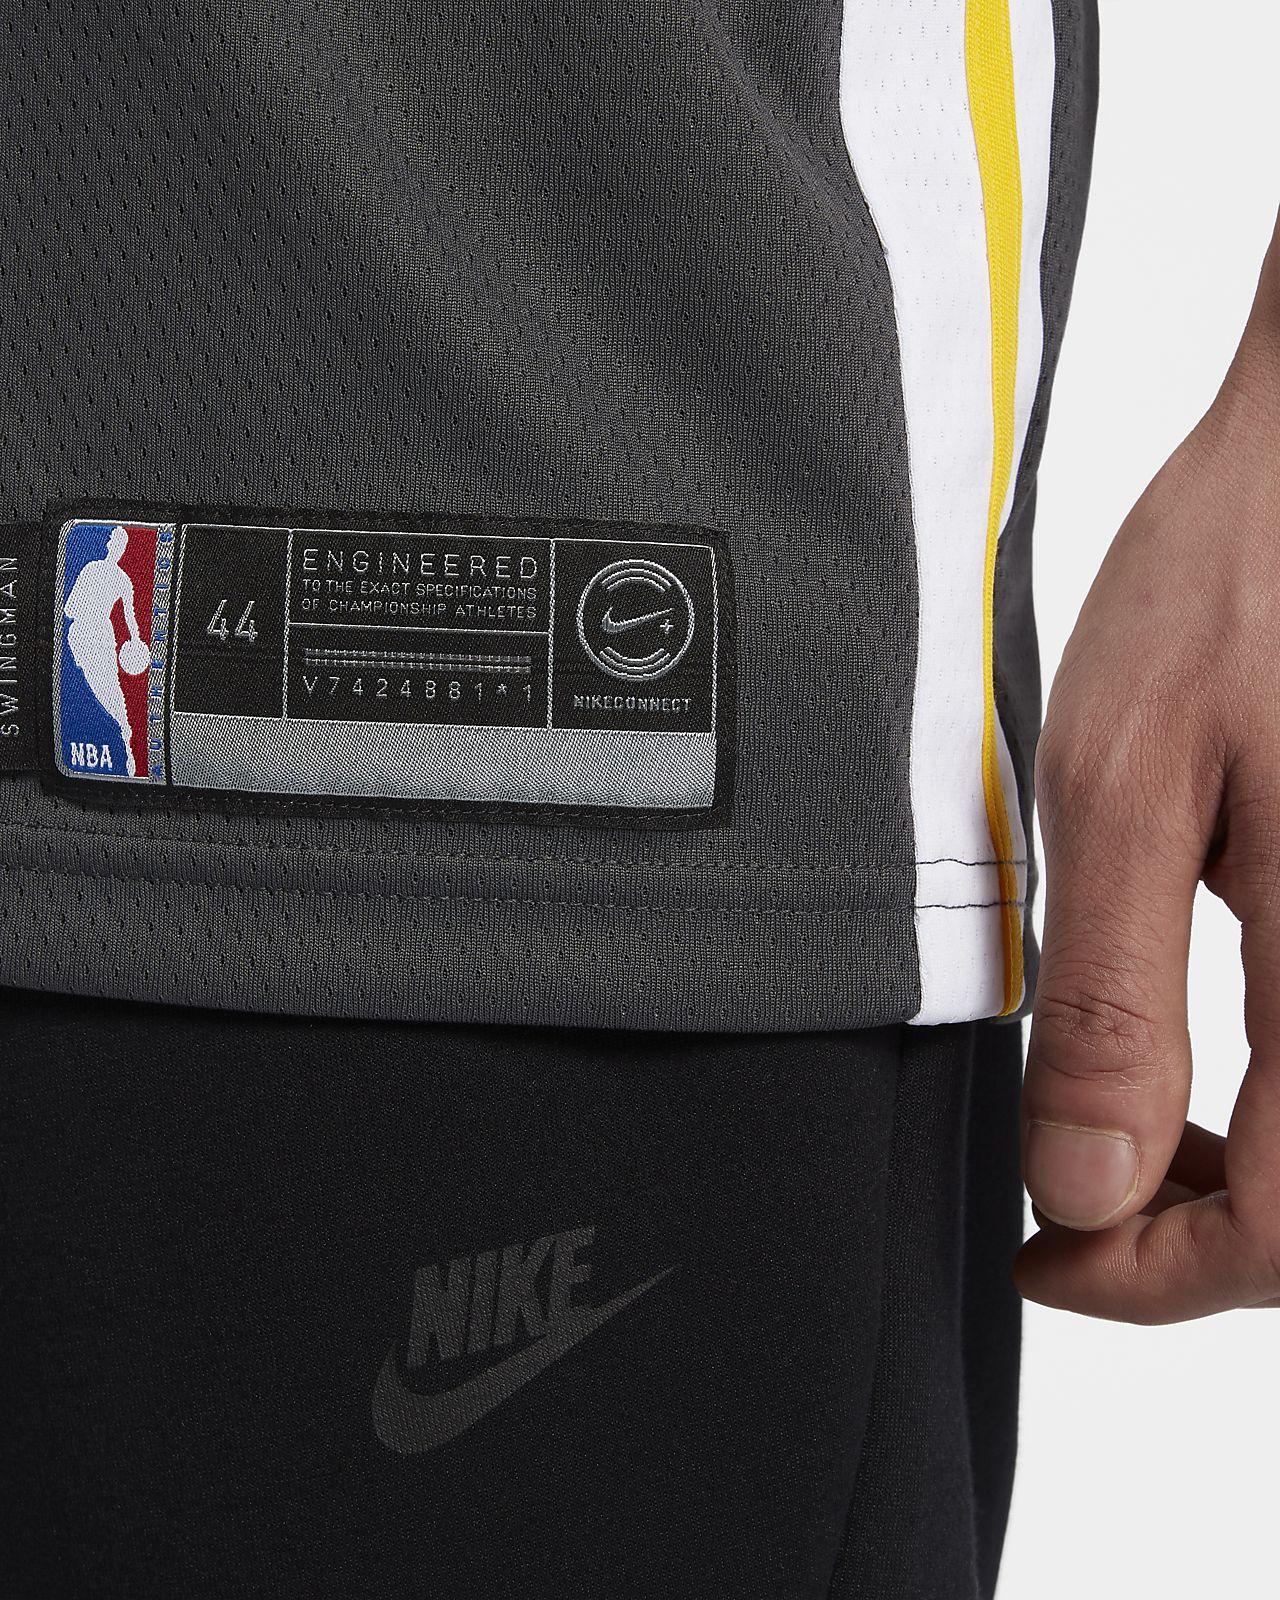 deef0bdb ... Stephen Curry Statement Edition Swingman (Golden State Warriors) Men's  Nike NBA Connected Jersey